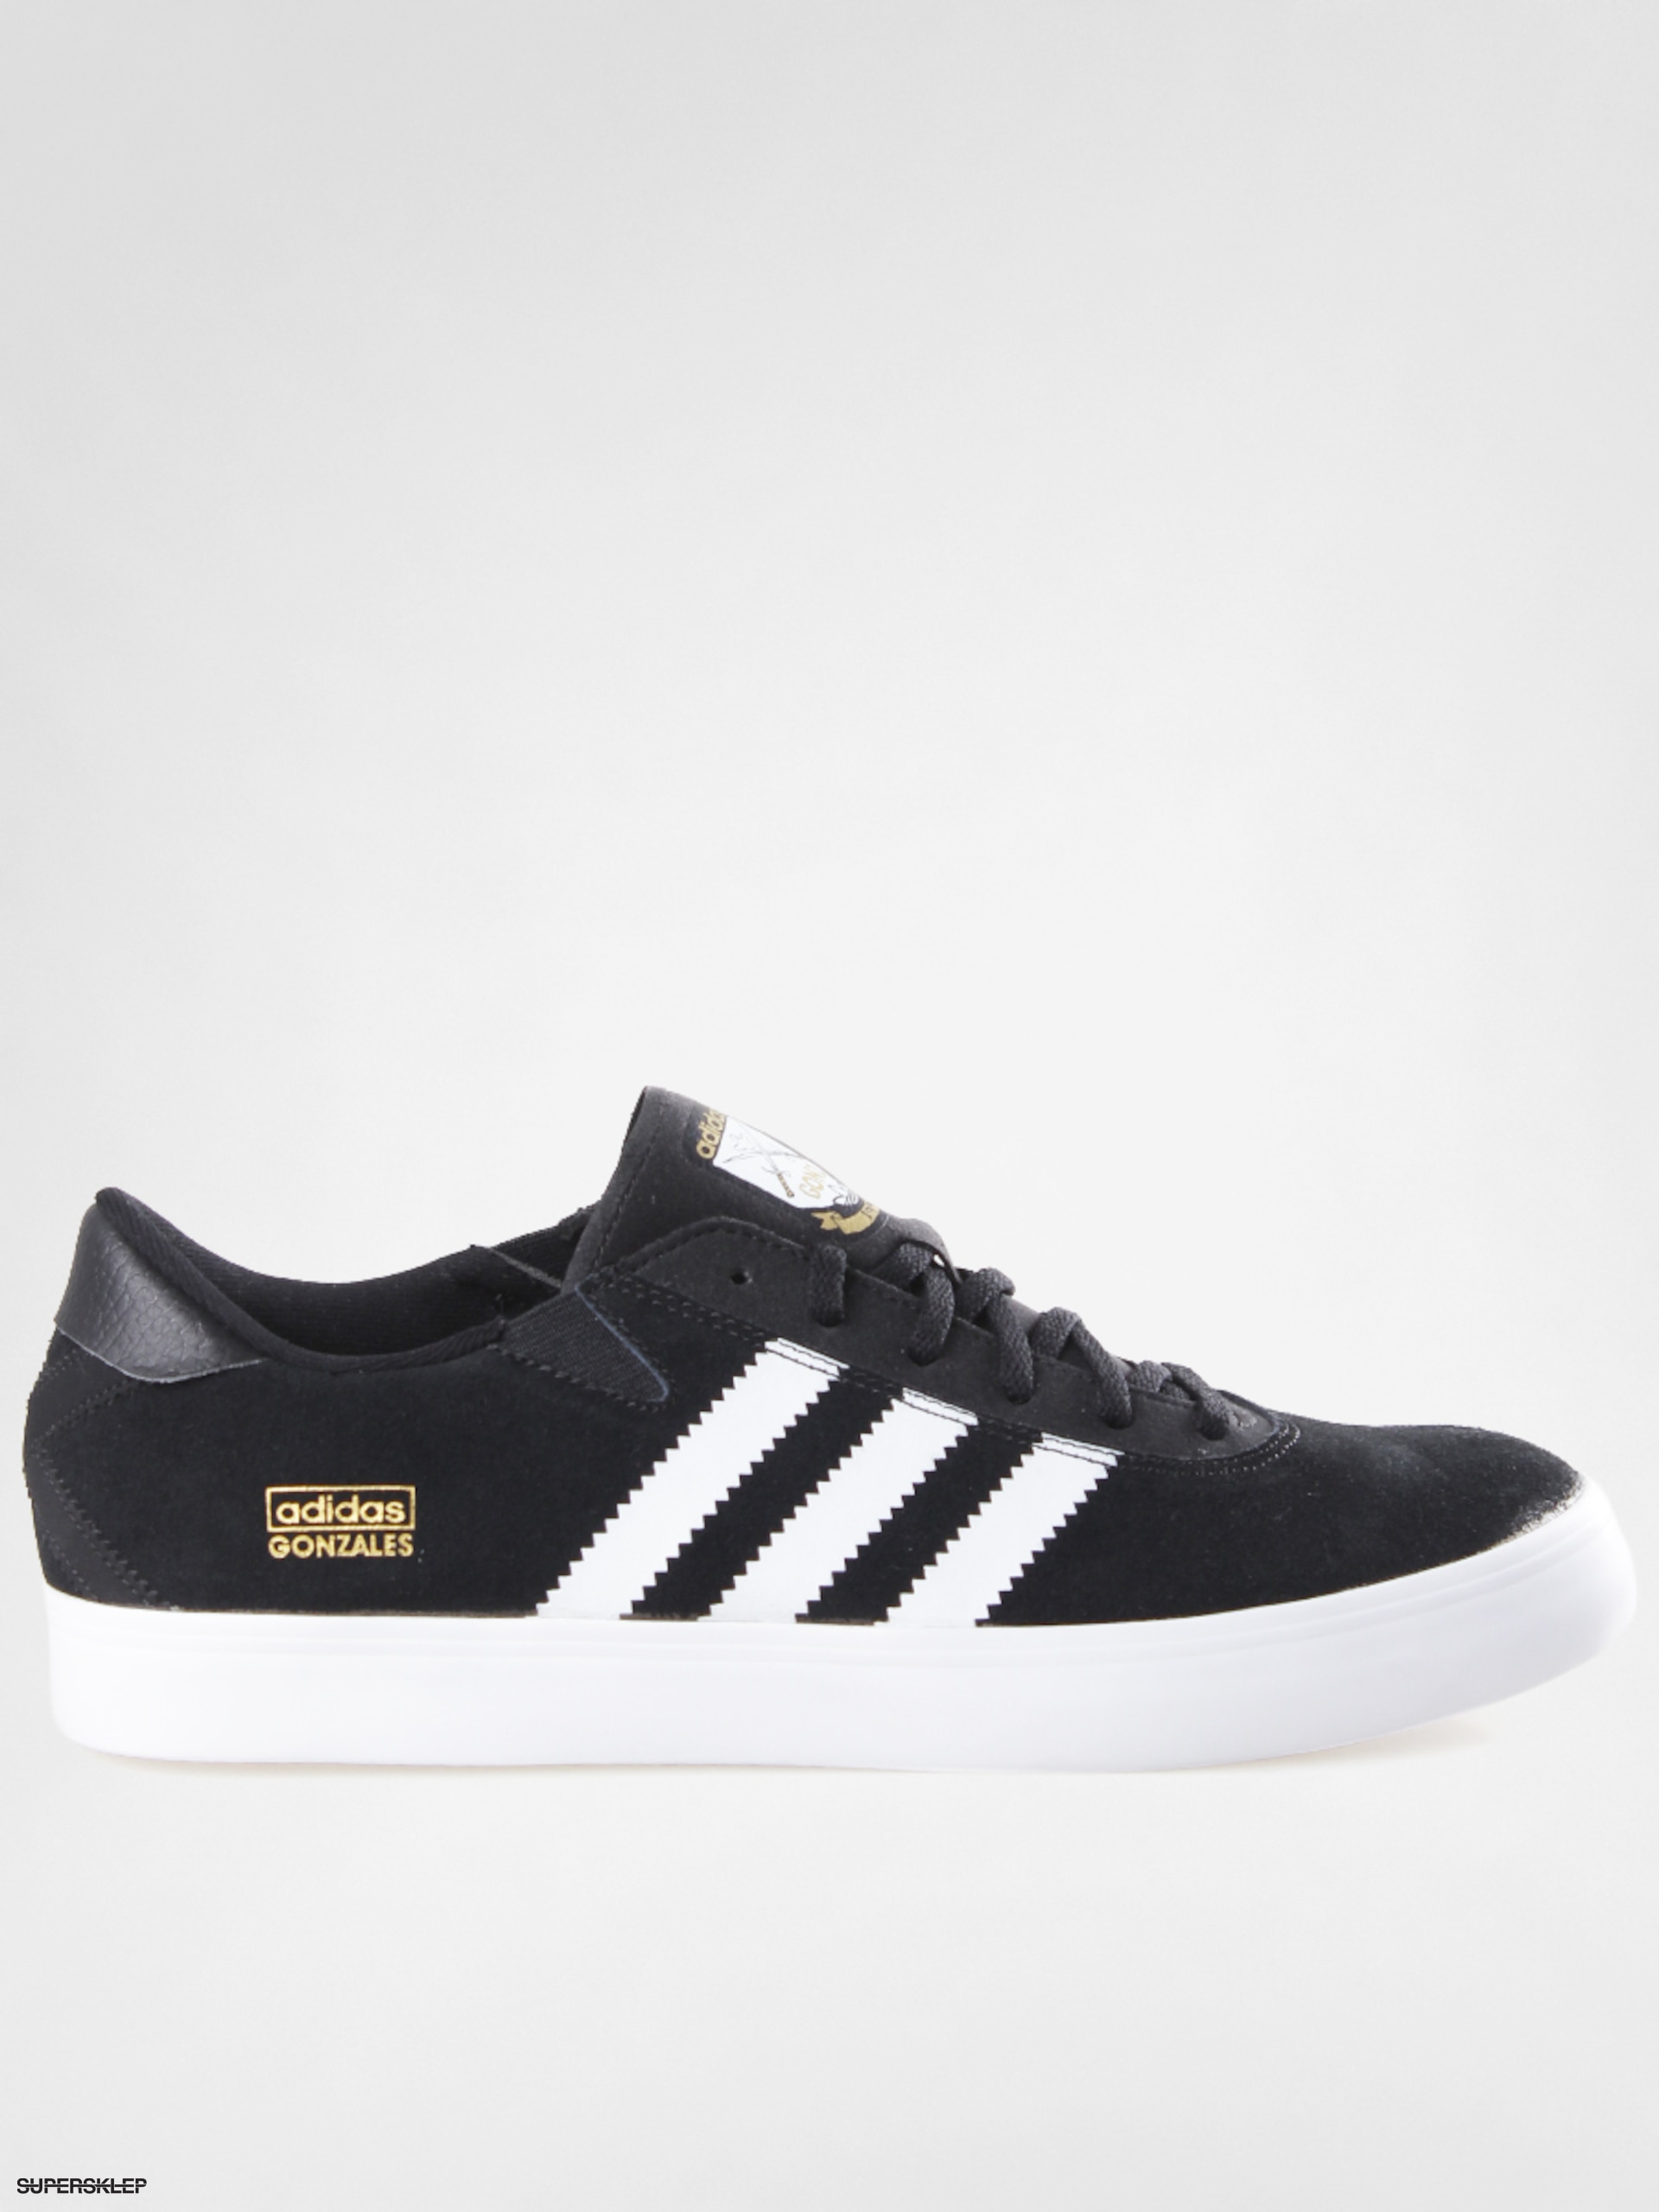 quality design 3158c 67caf Buty adidas Gonz Pros (black1runwhiteblack1)